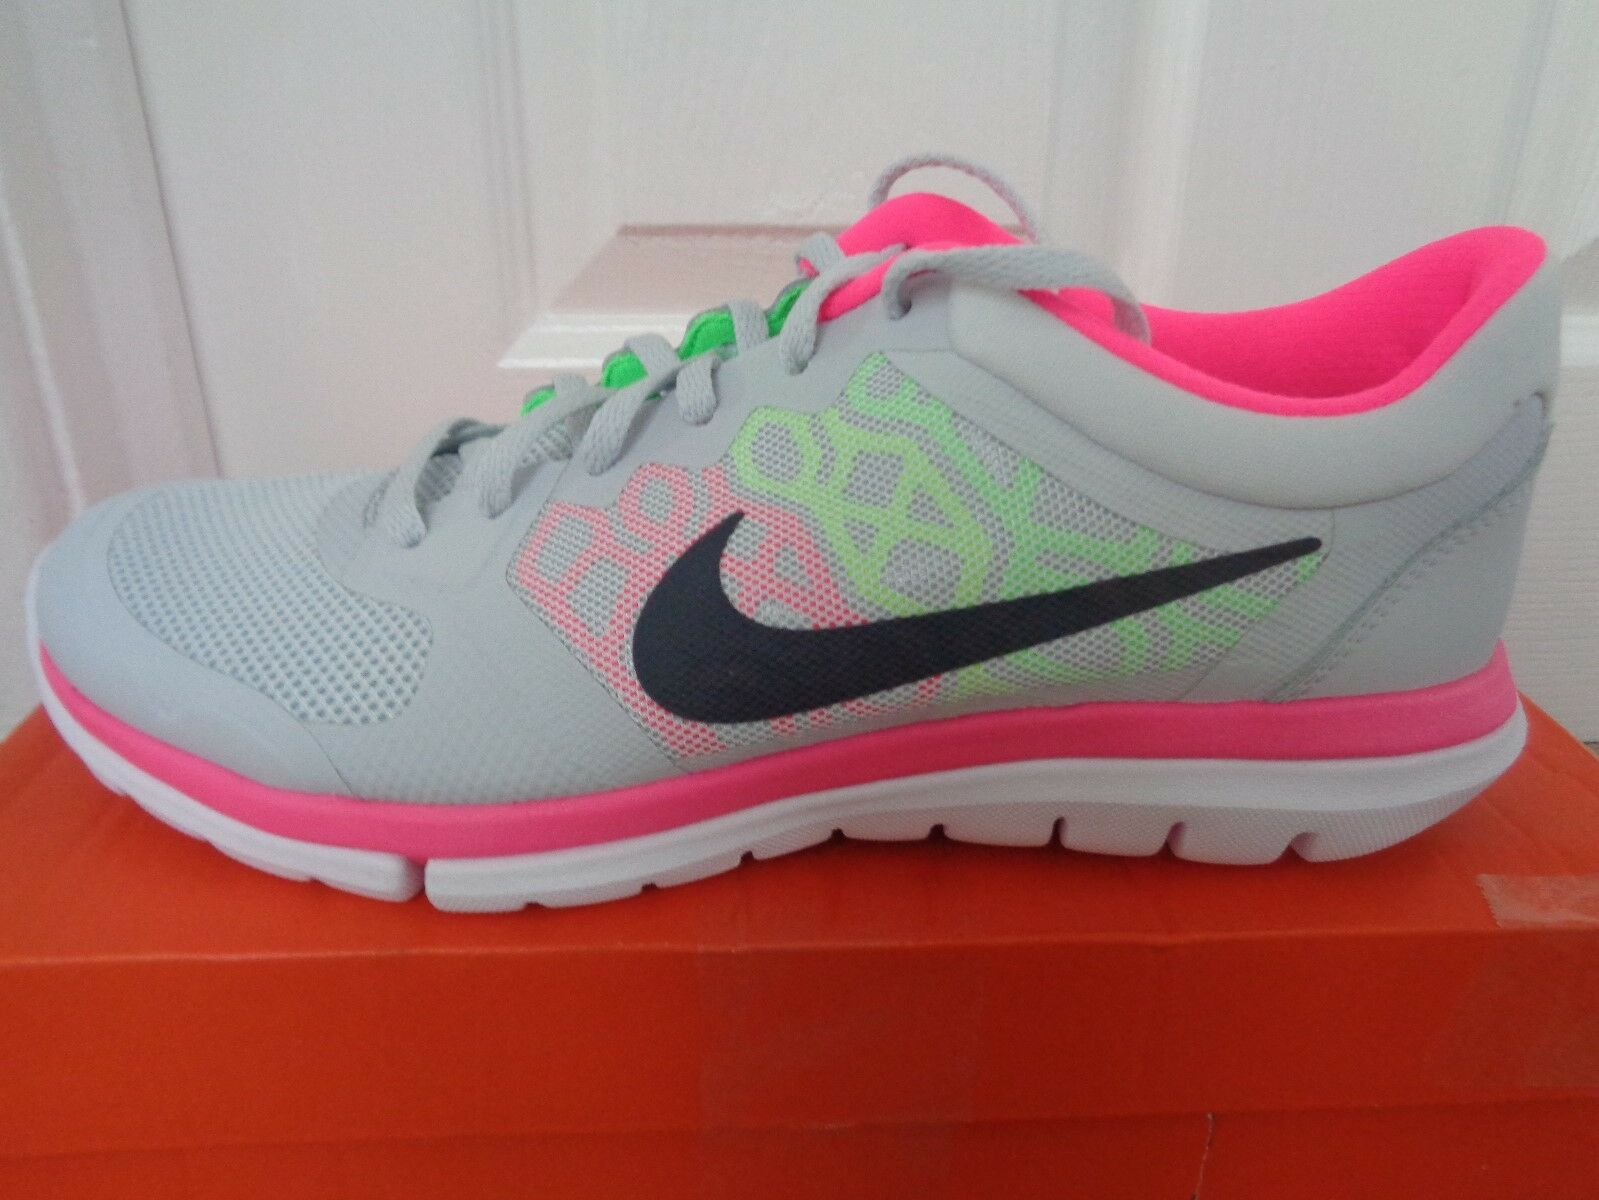 Nike Flex 2018 RN Femme trainers sneakers 709021 016 uk 7.5 eu 42 us 10 NEW+BOX